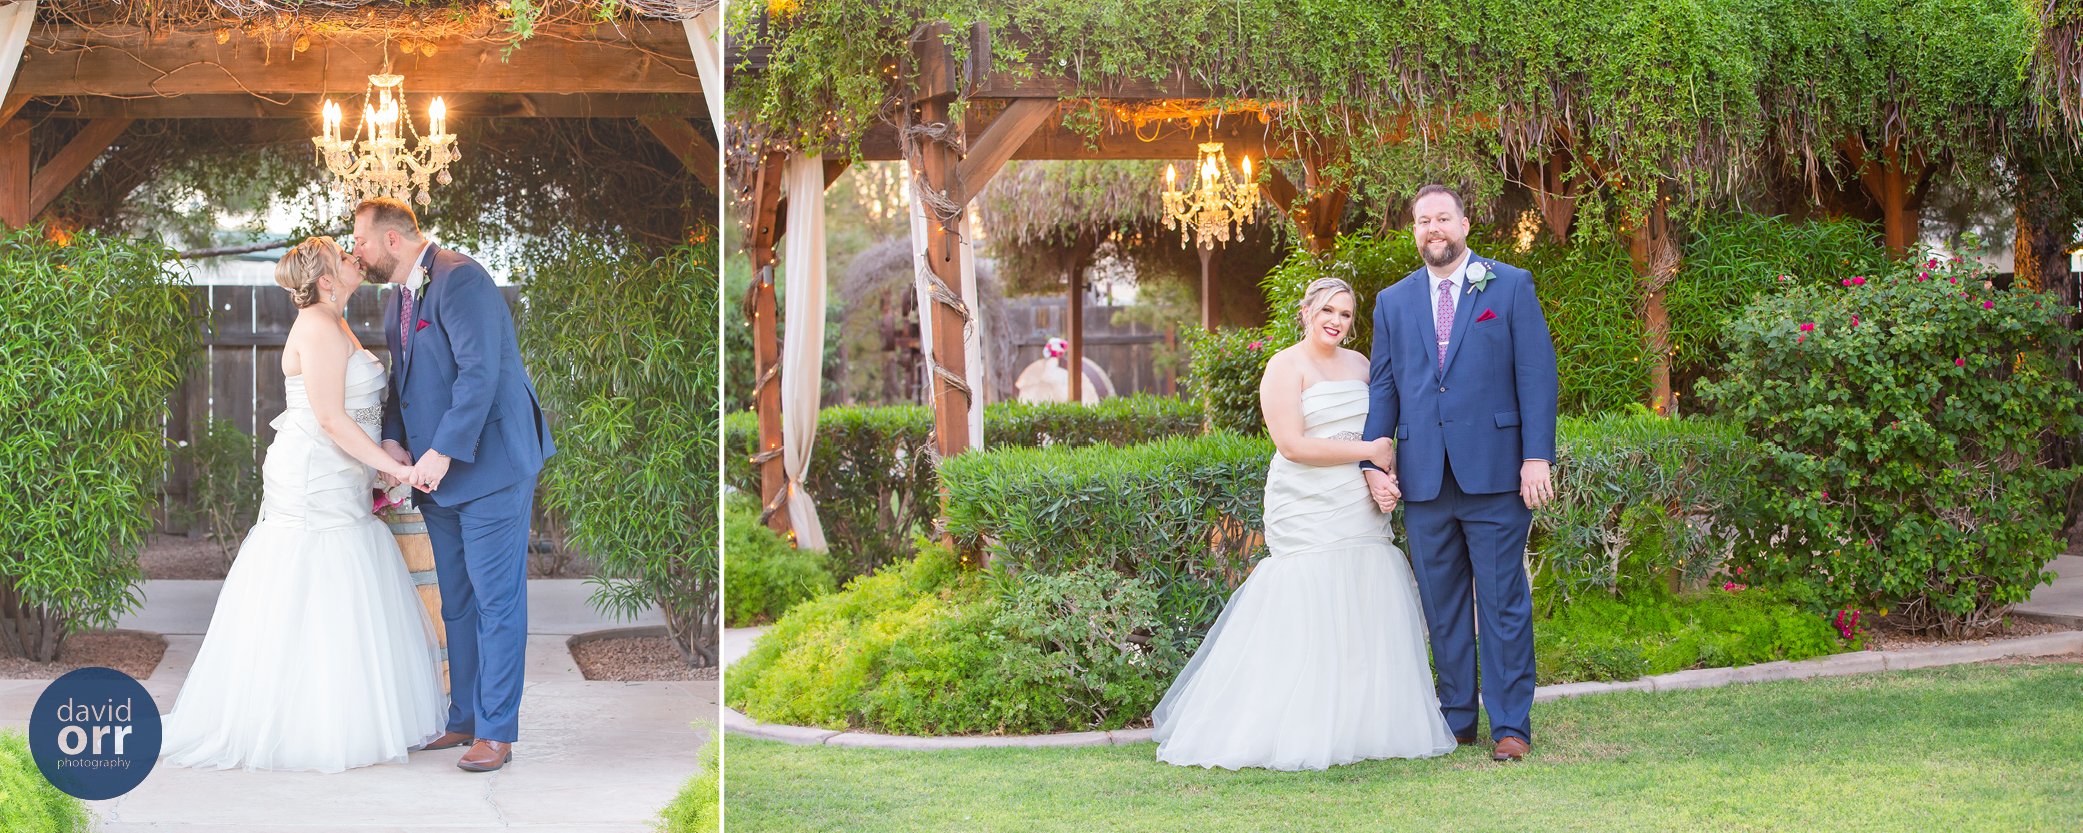 David-Orr-Photography_Shenandoah-Mill-Wedding10-GilbertVenue.jpg